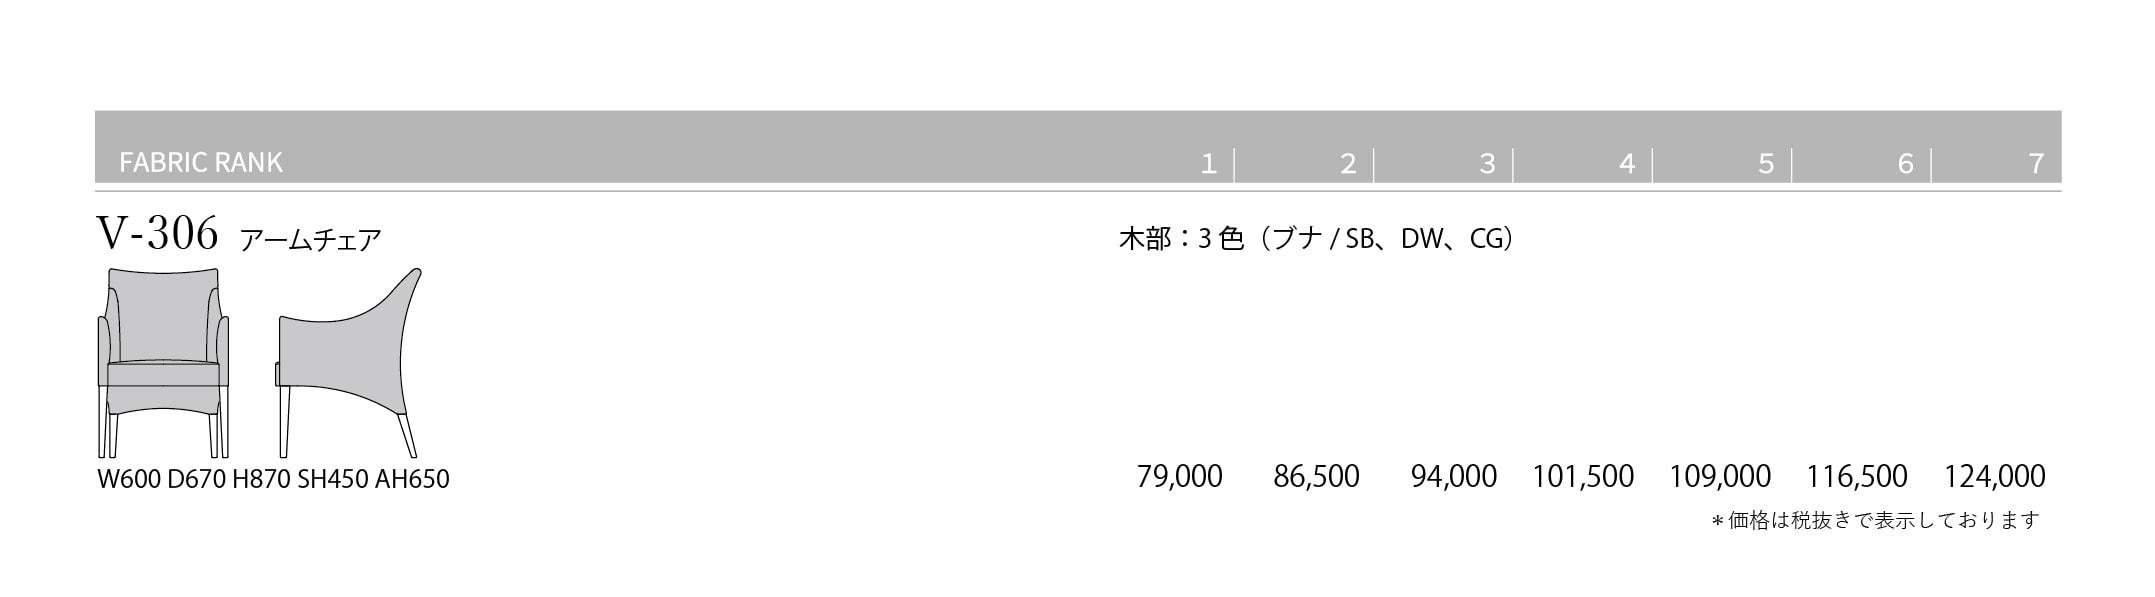 V-306 Price List